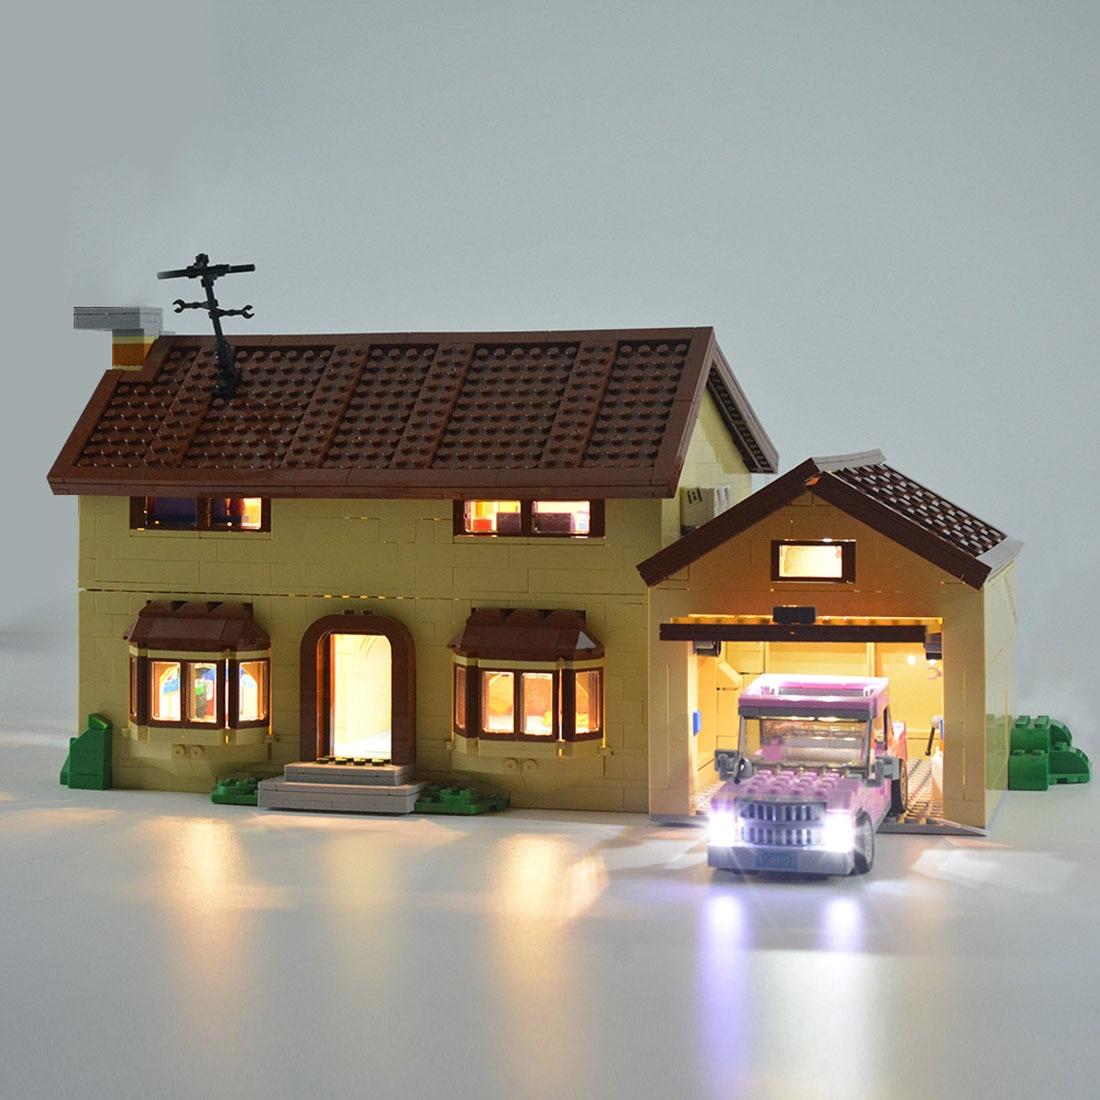 modiker pequenas particulas brinquedo led bloco de construcao usb luz acessorio kit para casa 71006 led